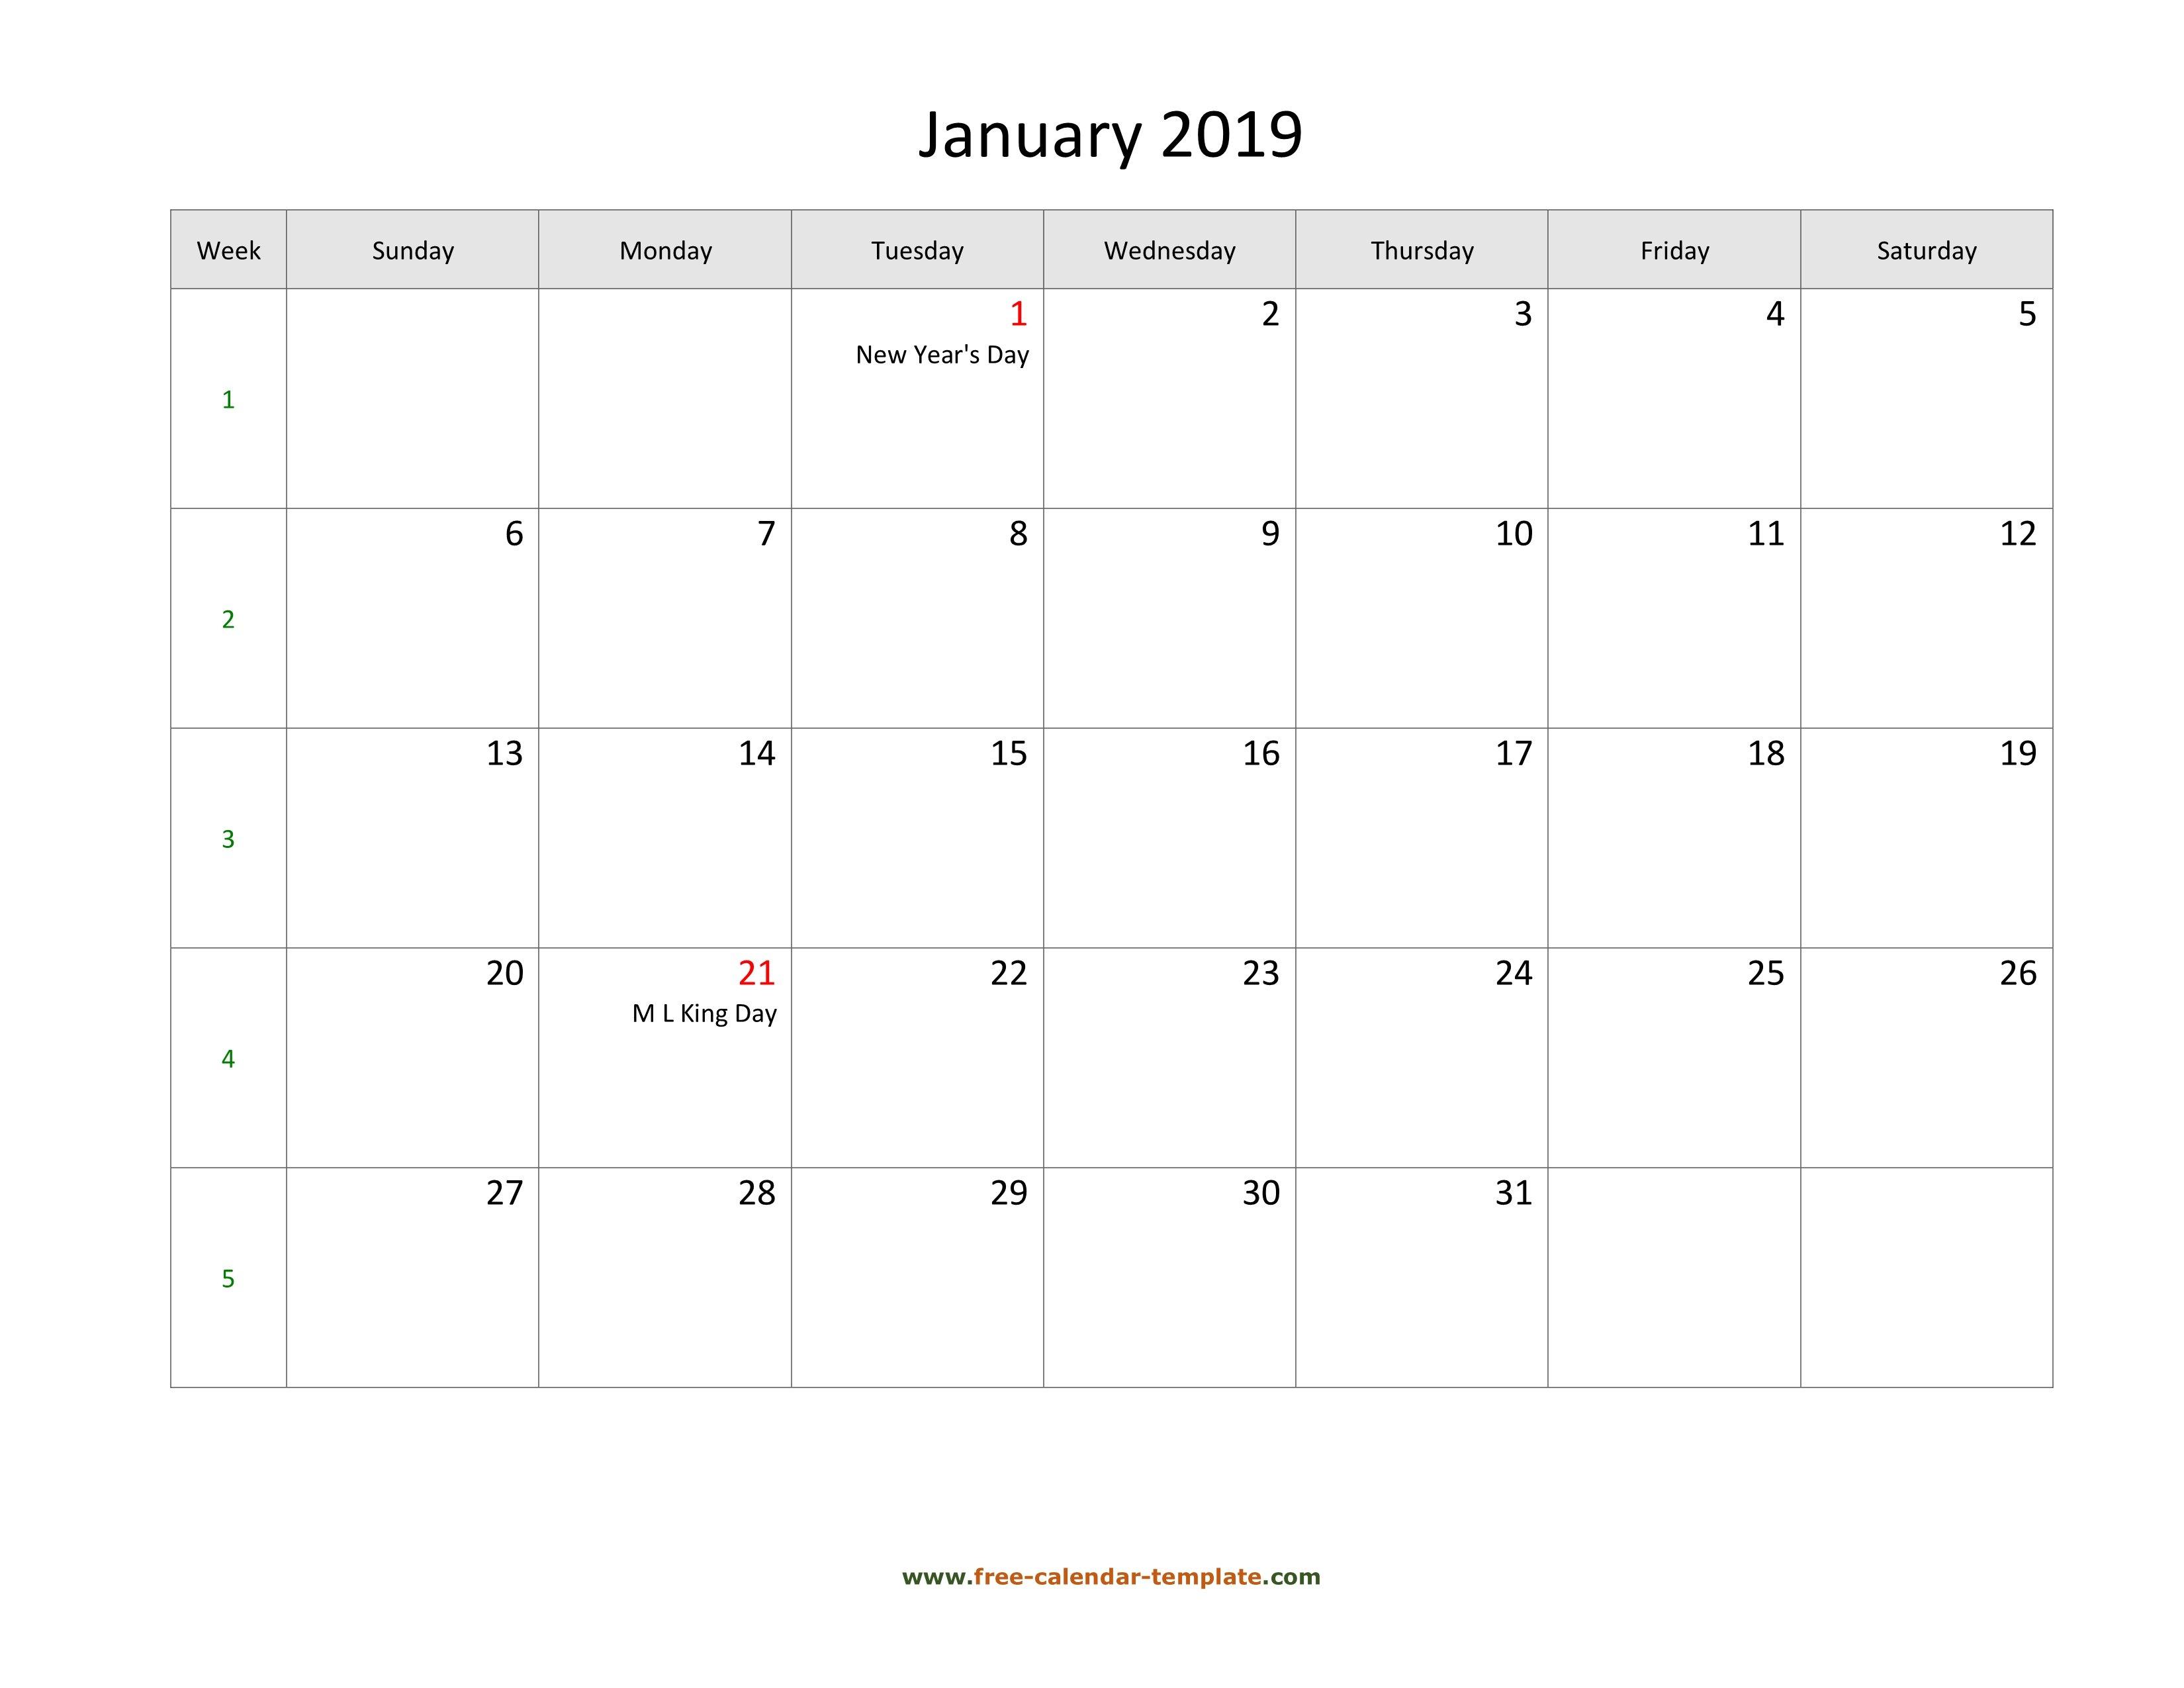 Free 2019 Calendar Blank January Template (Horizontal)   Free Calendar 2019 January Pdf